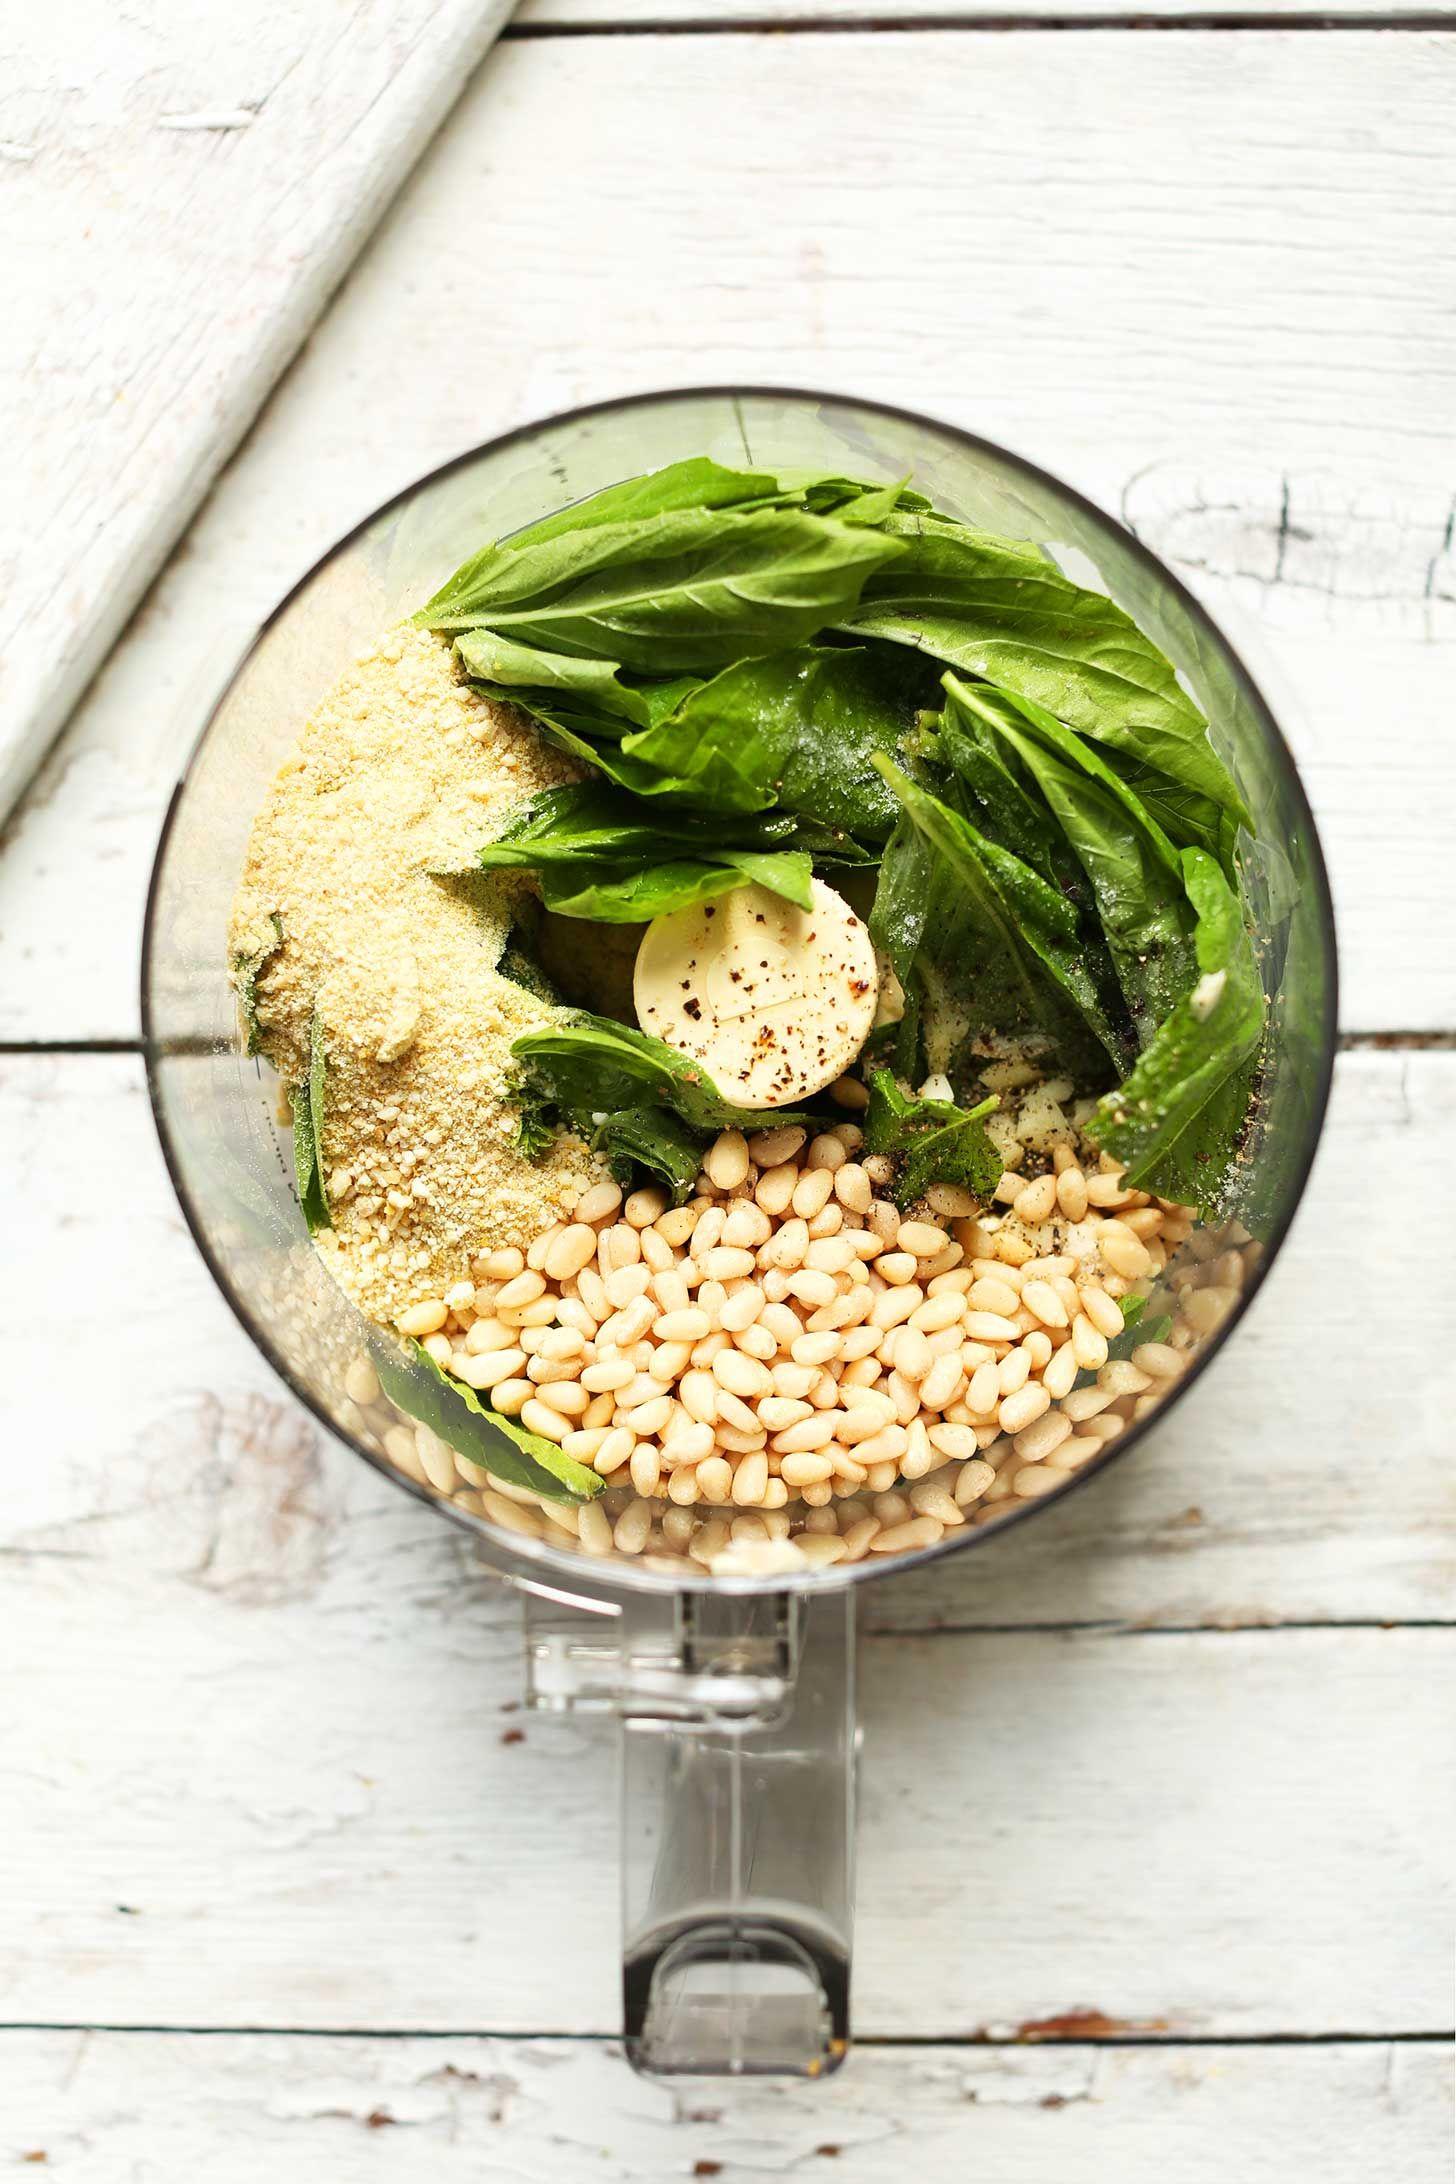 30 Minute Pesto Penne Pasta Salad #pesto #pasta #penne #salad #easy #vegan #glutenfree #pasta #recipe